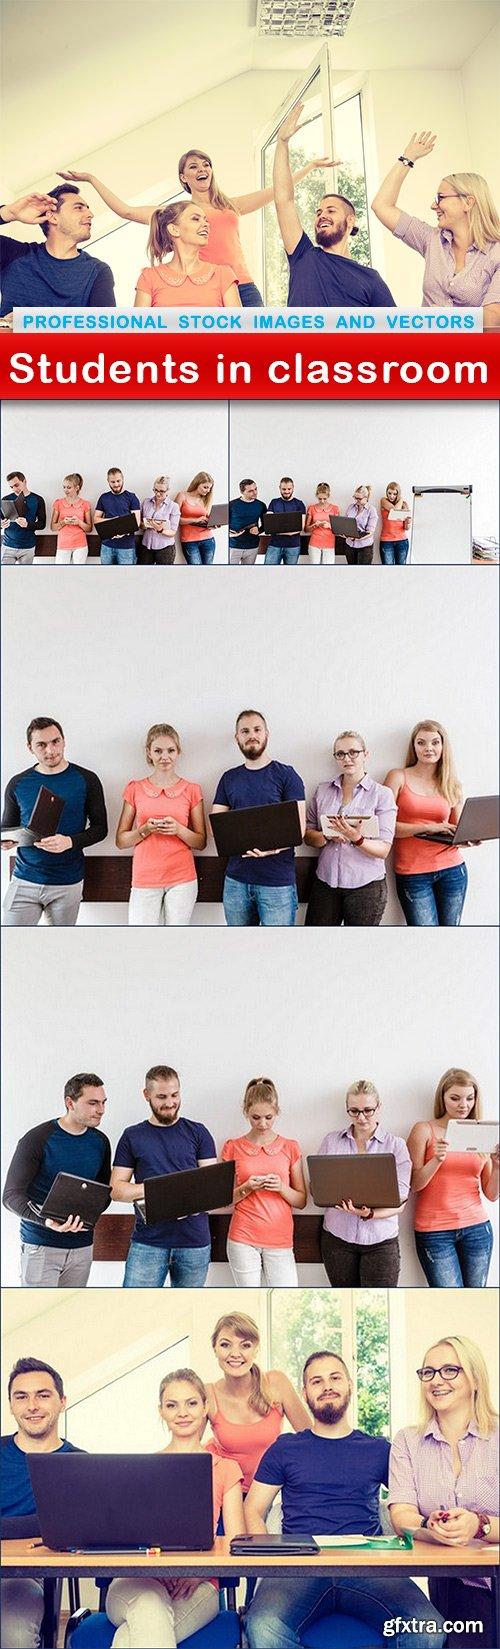 Students in classroom - 6 UHQ JPEG